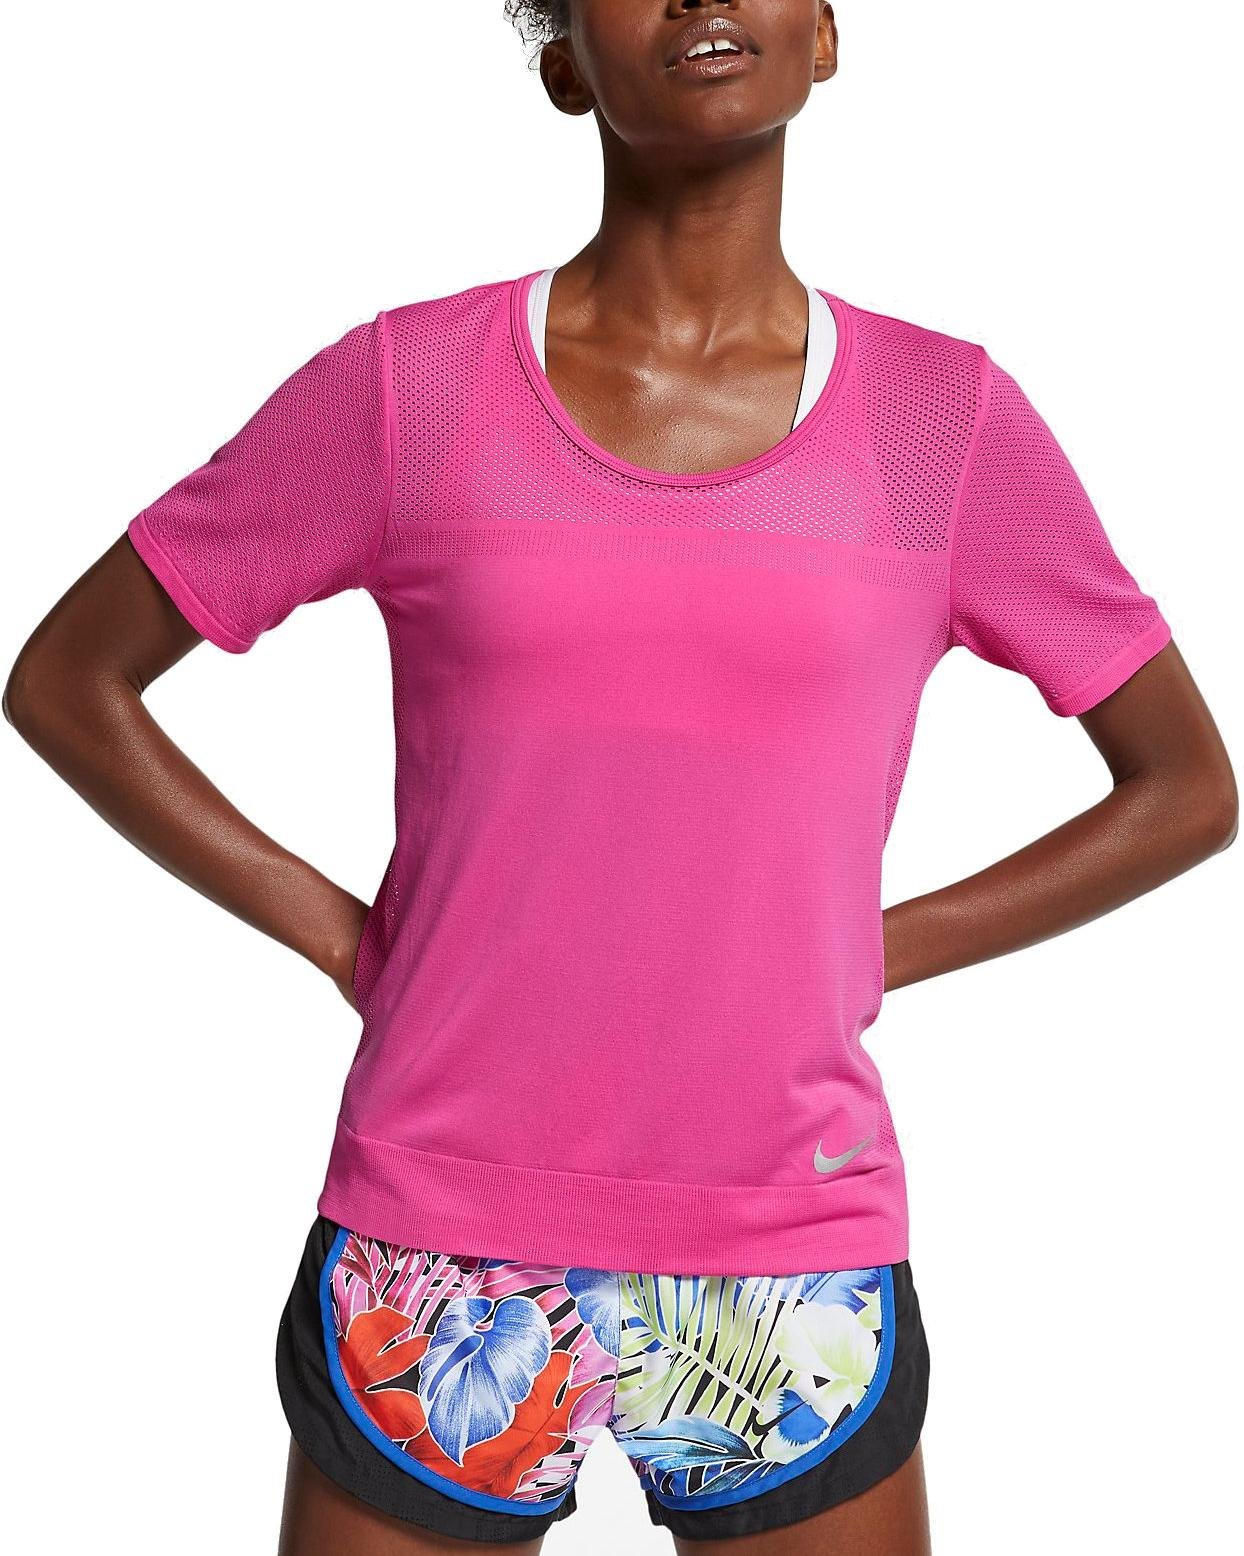 Dámské běžecké triko s krátkým rukávem Nike Infinite